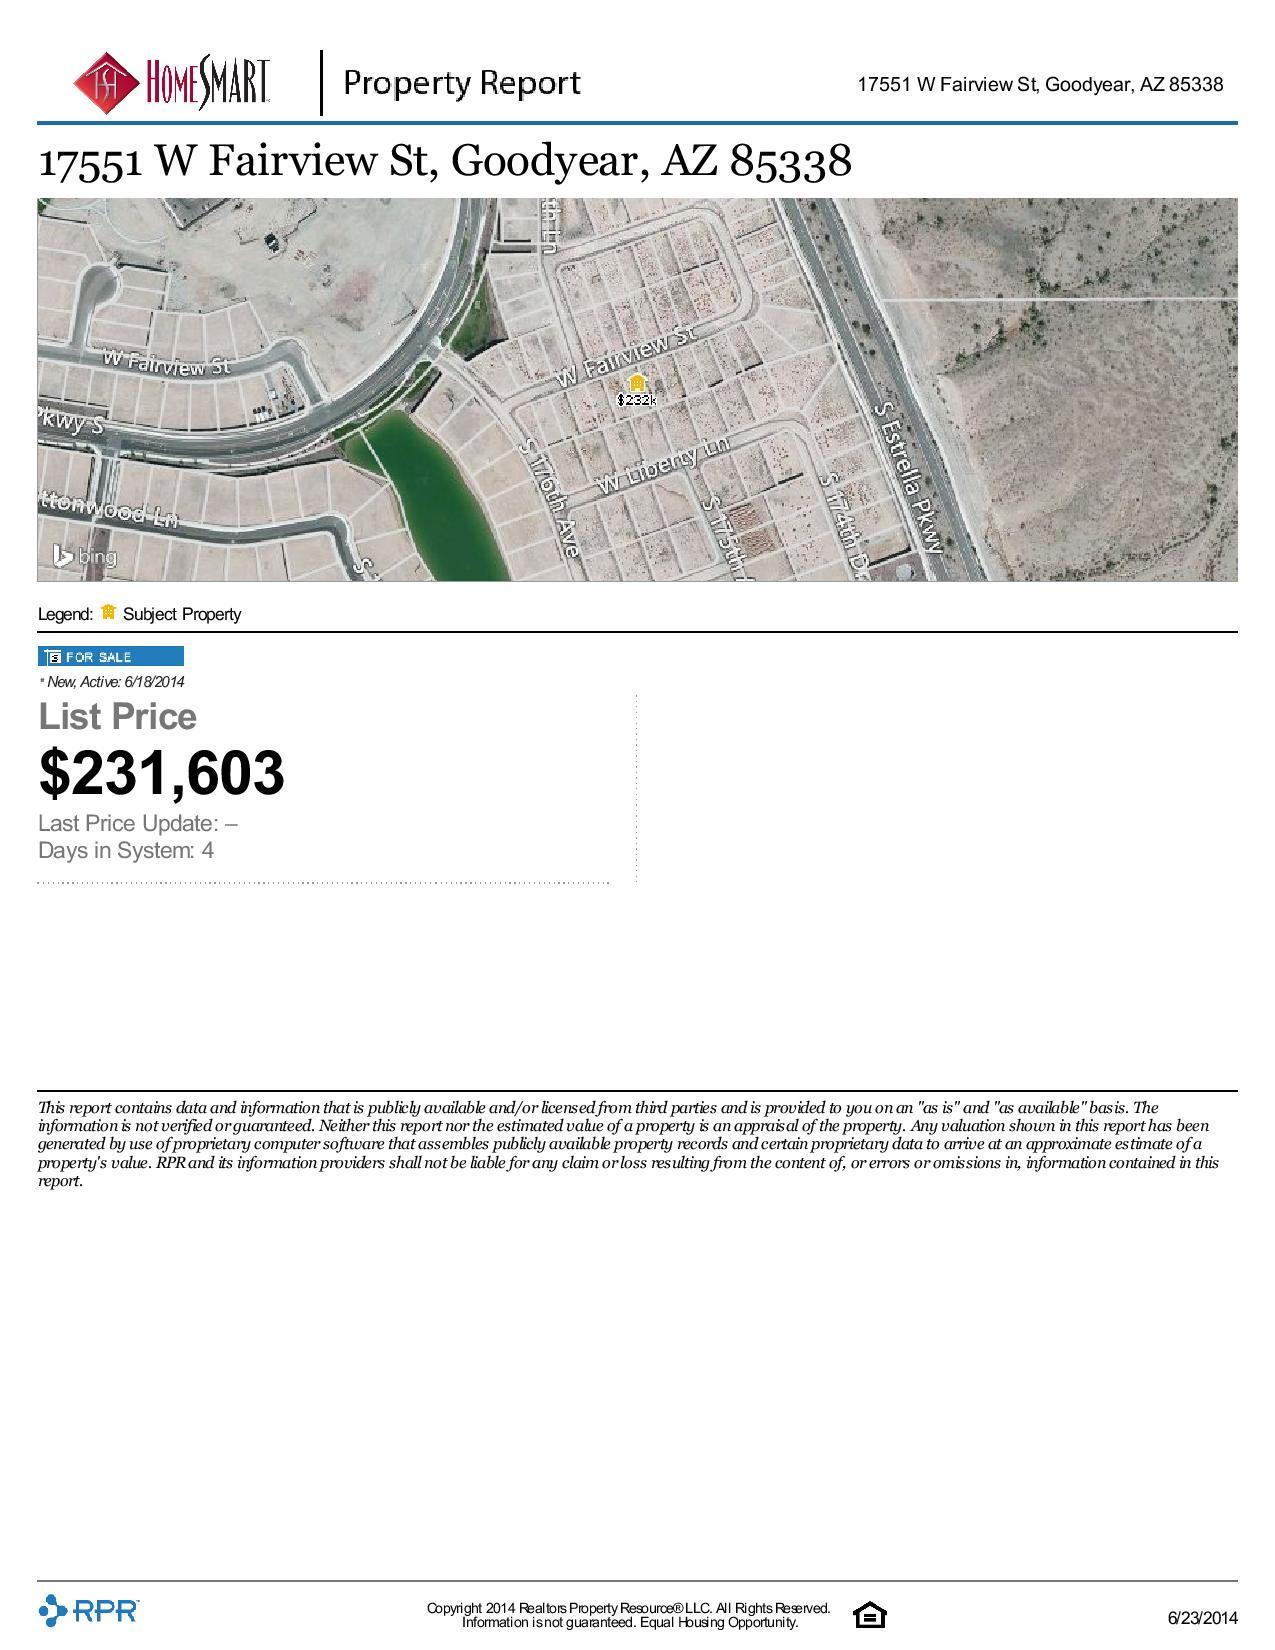 17551-W-Fairview-St-Goodyear-AZ-85338-page-002